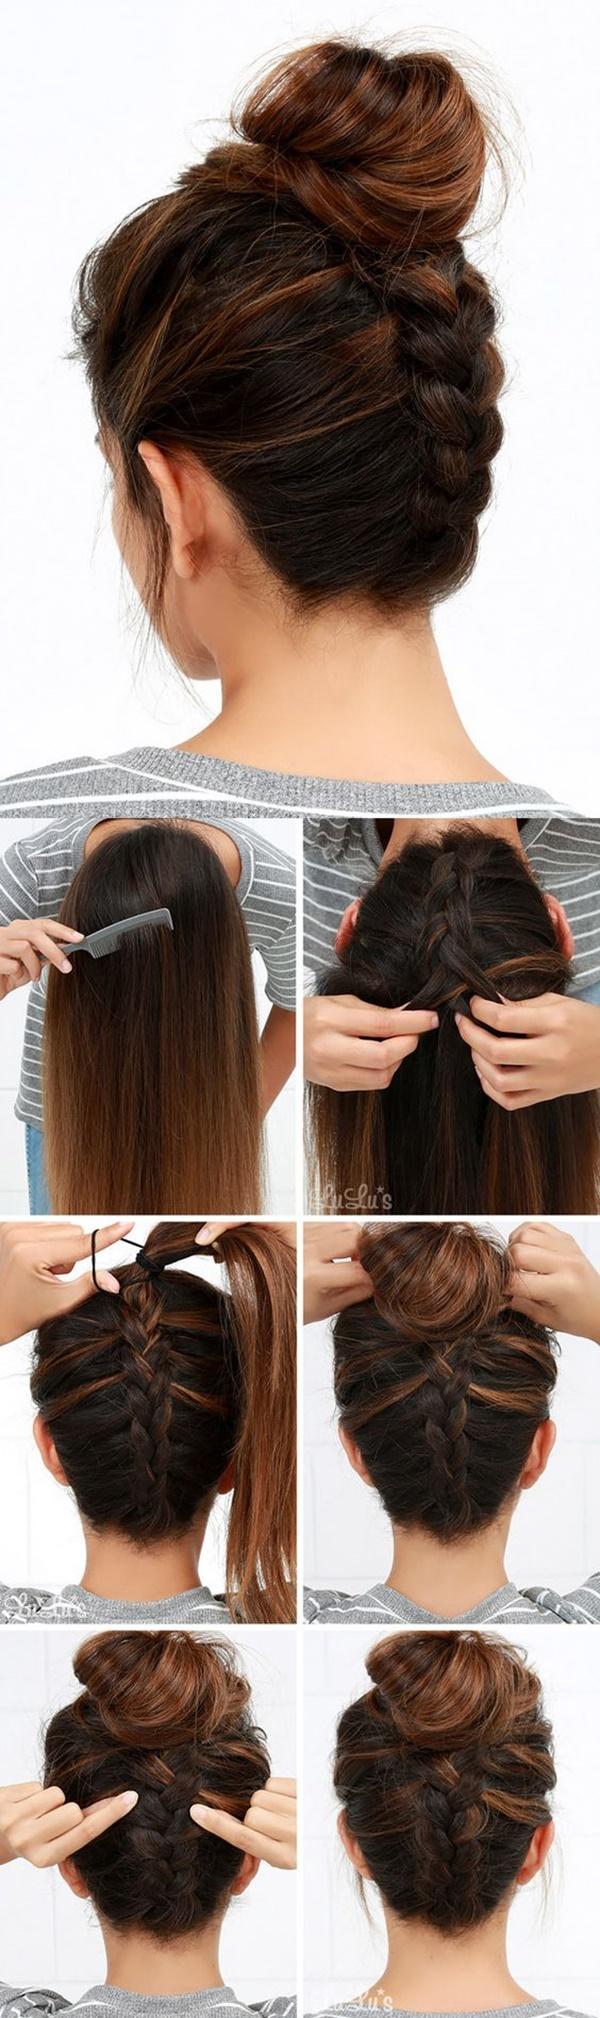 messy-bun-hairstyles-45